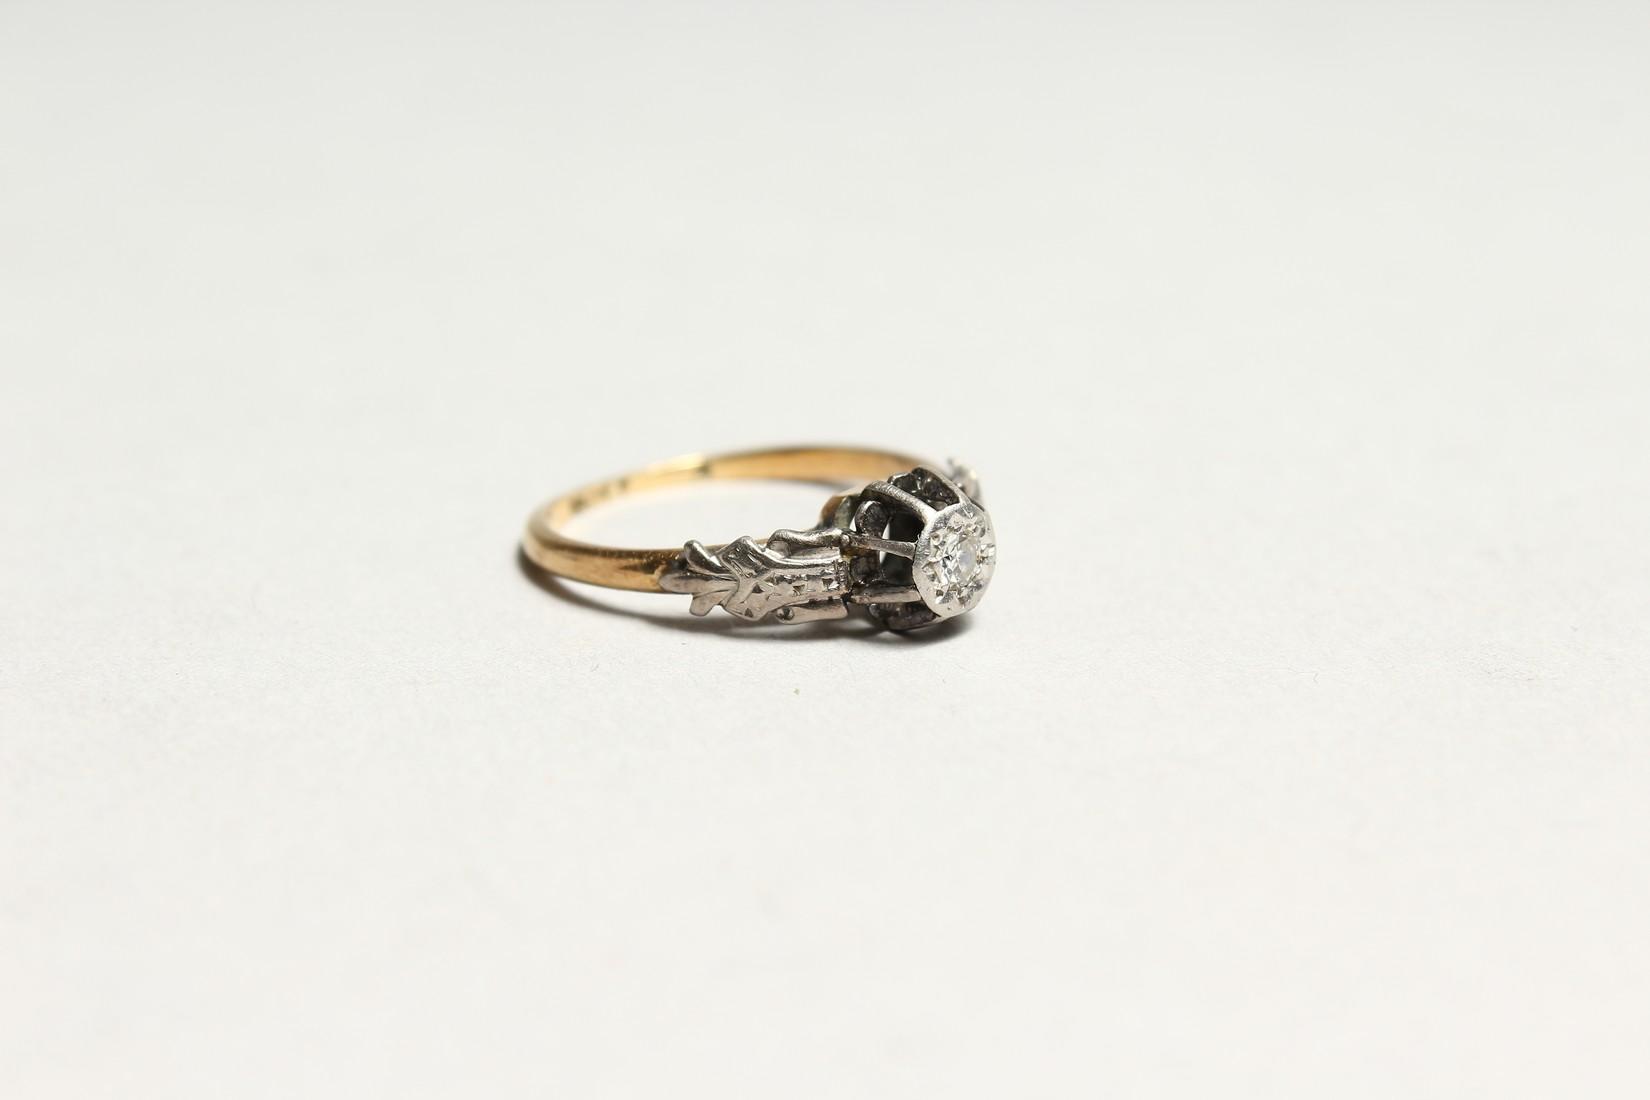 A GOOD 18CT GOLD DIAMOND SET RING - Image 3 of 5